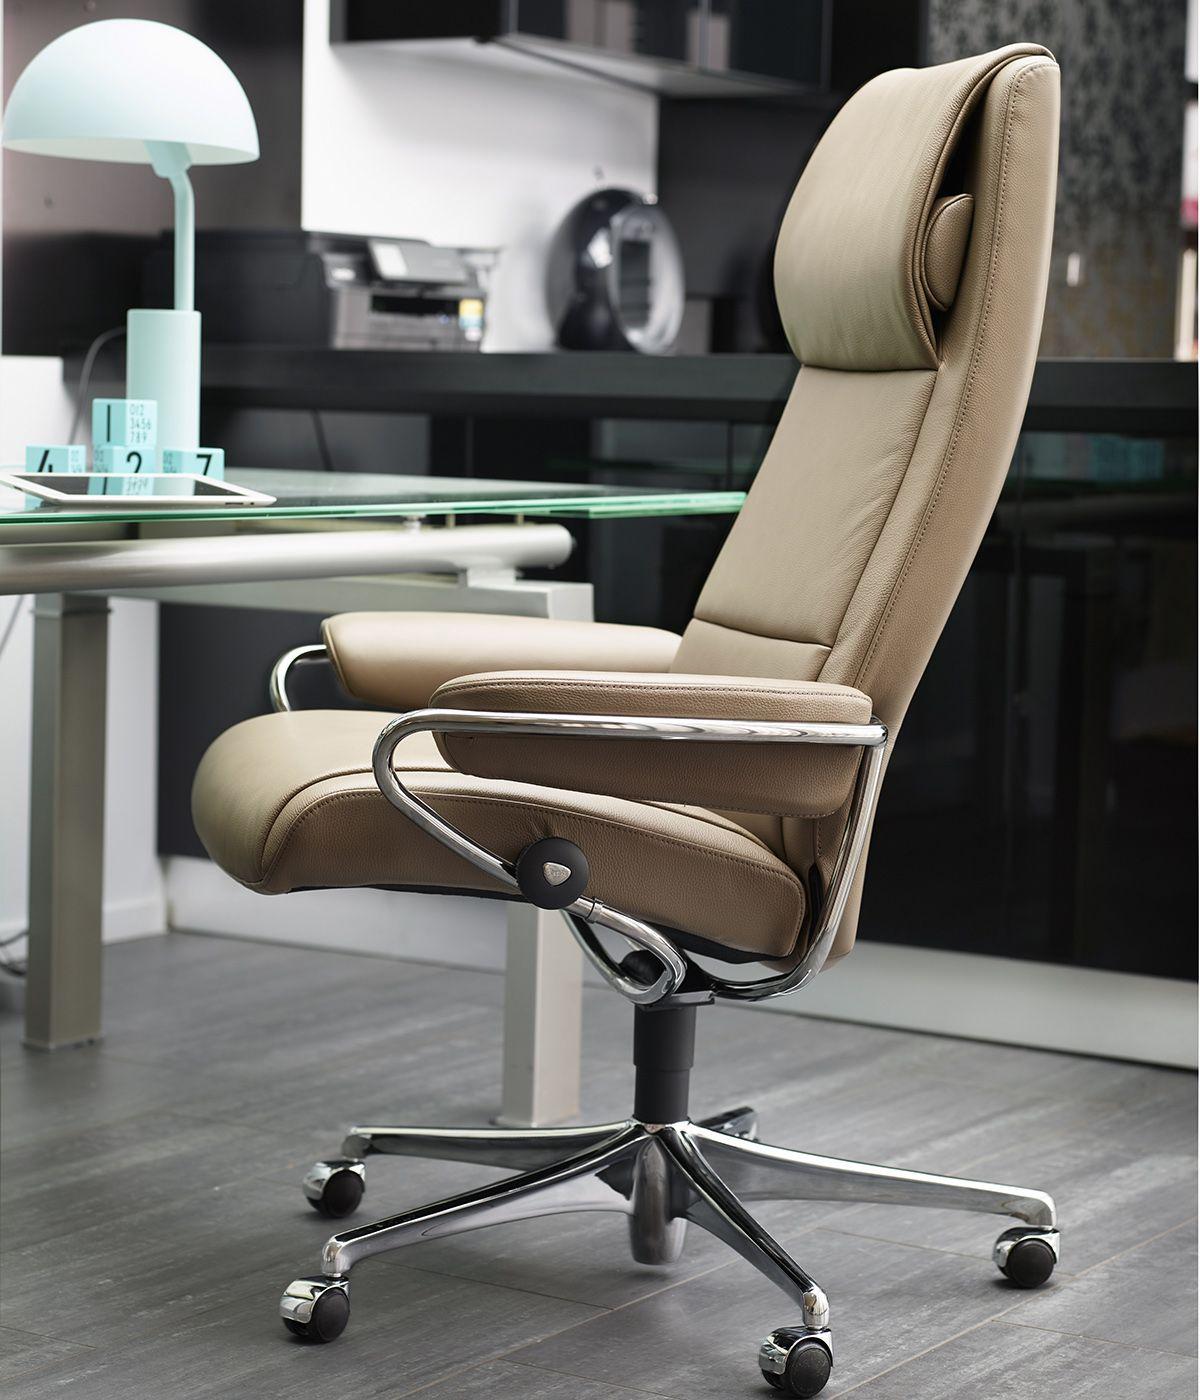 arbeitsplatz home office stressless paris pause home. Black Bedroom Furniture Sets. Home Design Ideas